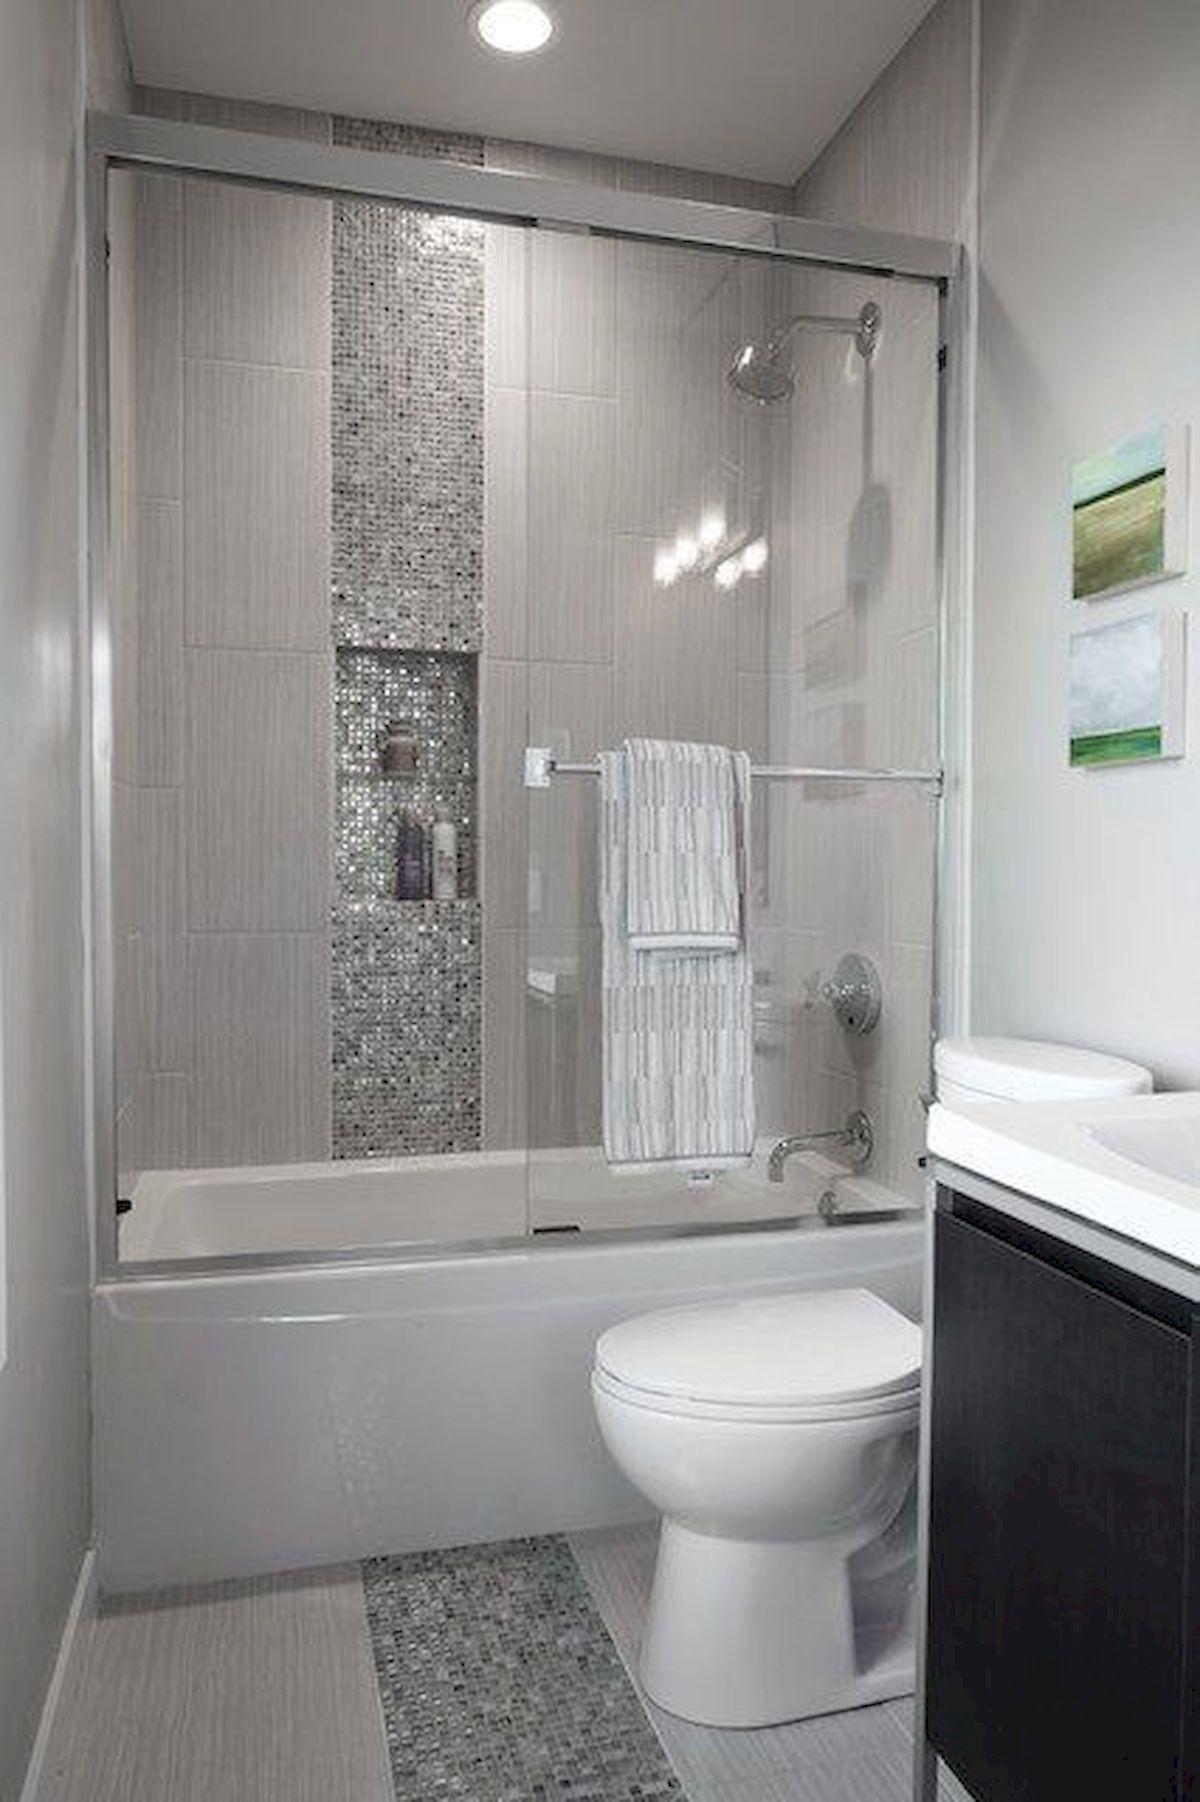 Bathroom Categories : Beautiful. Bathroom. Farmhouse. Decor. in 2020 |  Restroom remodel, Bathroom remodel master, Small bathroom remodel